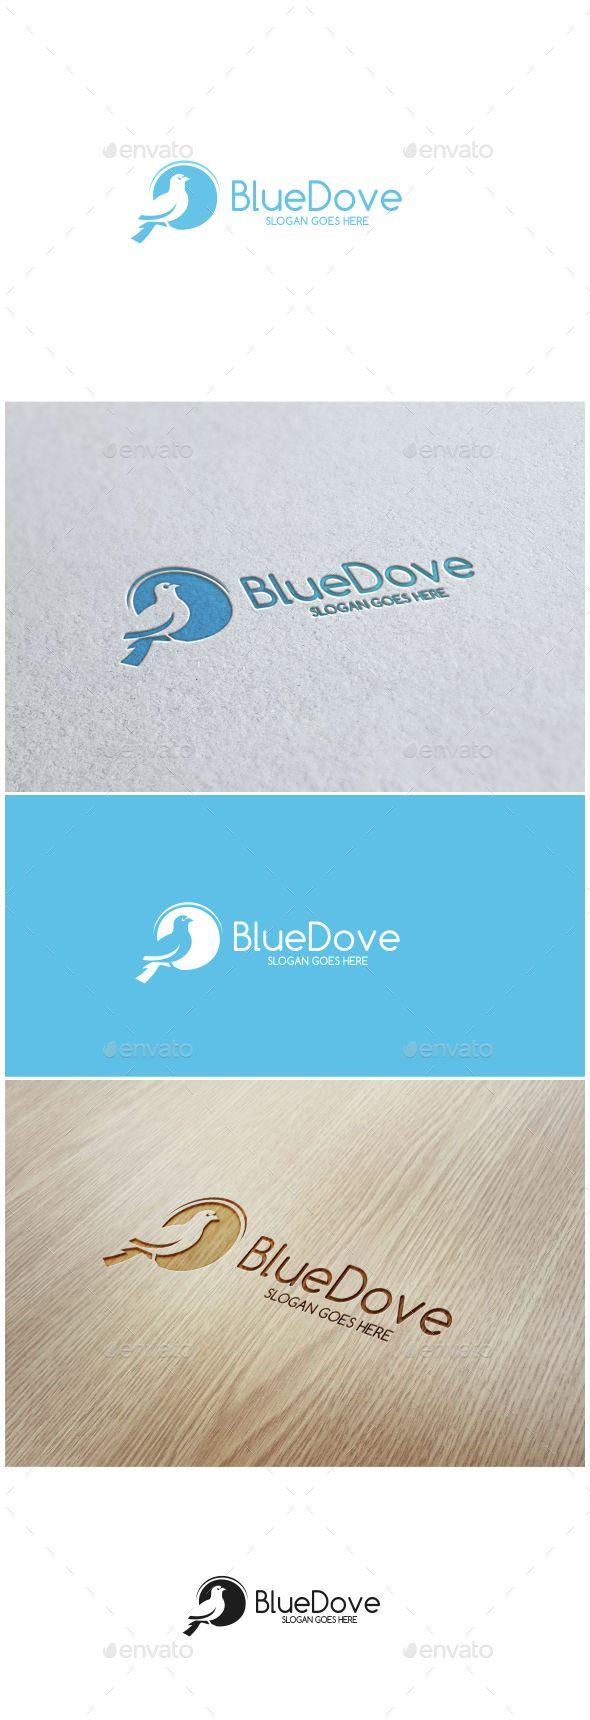 Blue Dove Logo http://graphicriver.net/user/ms_designer/portfolio?ref=MS_designer